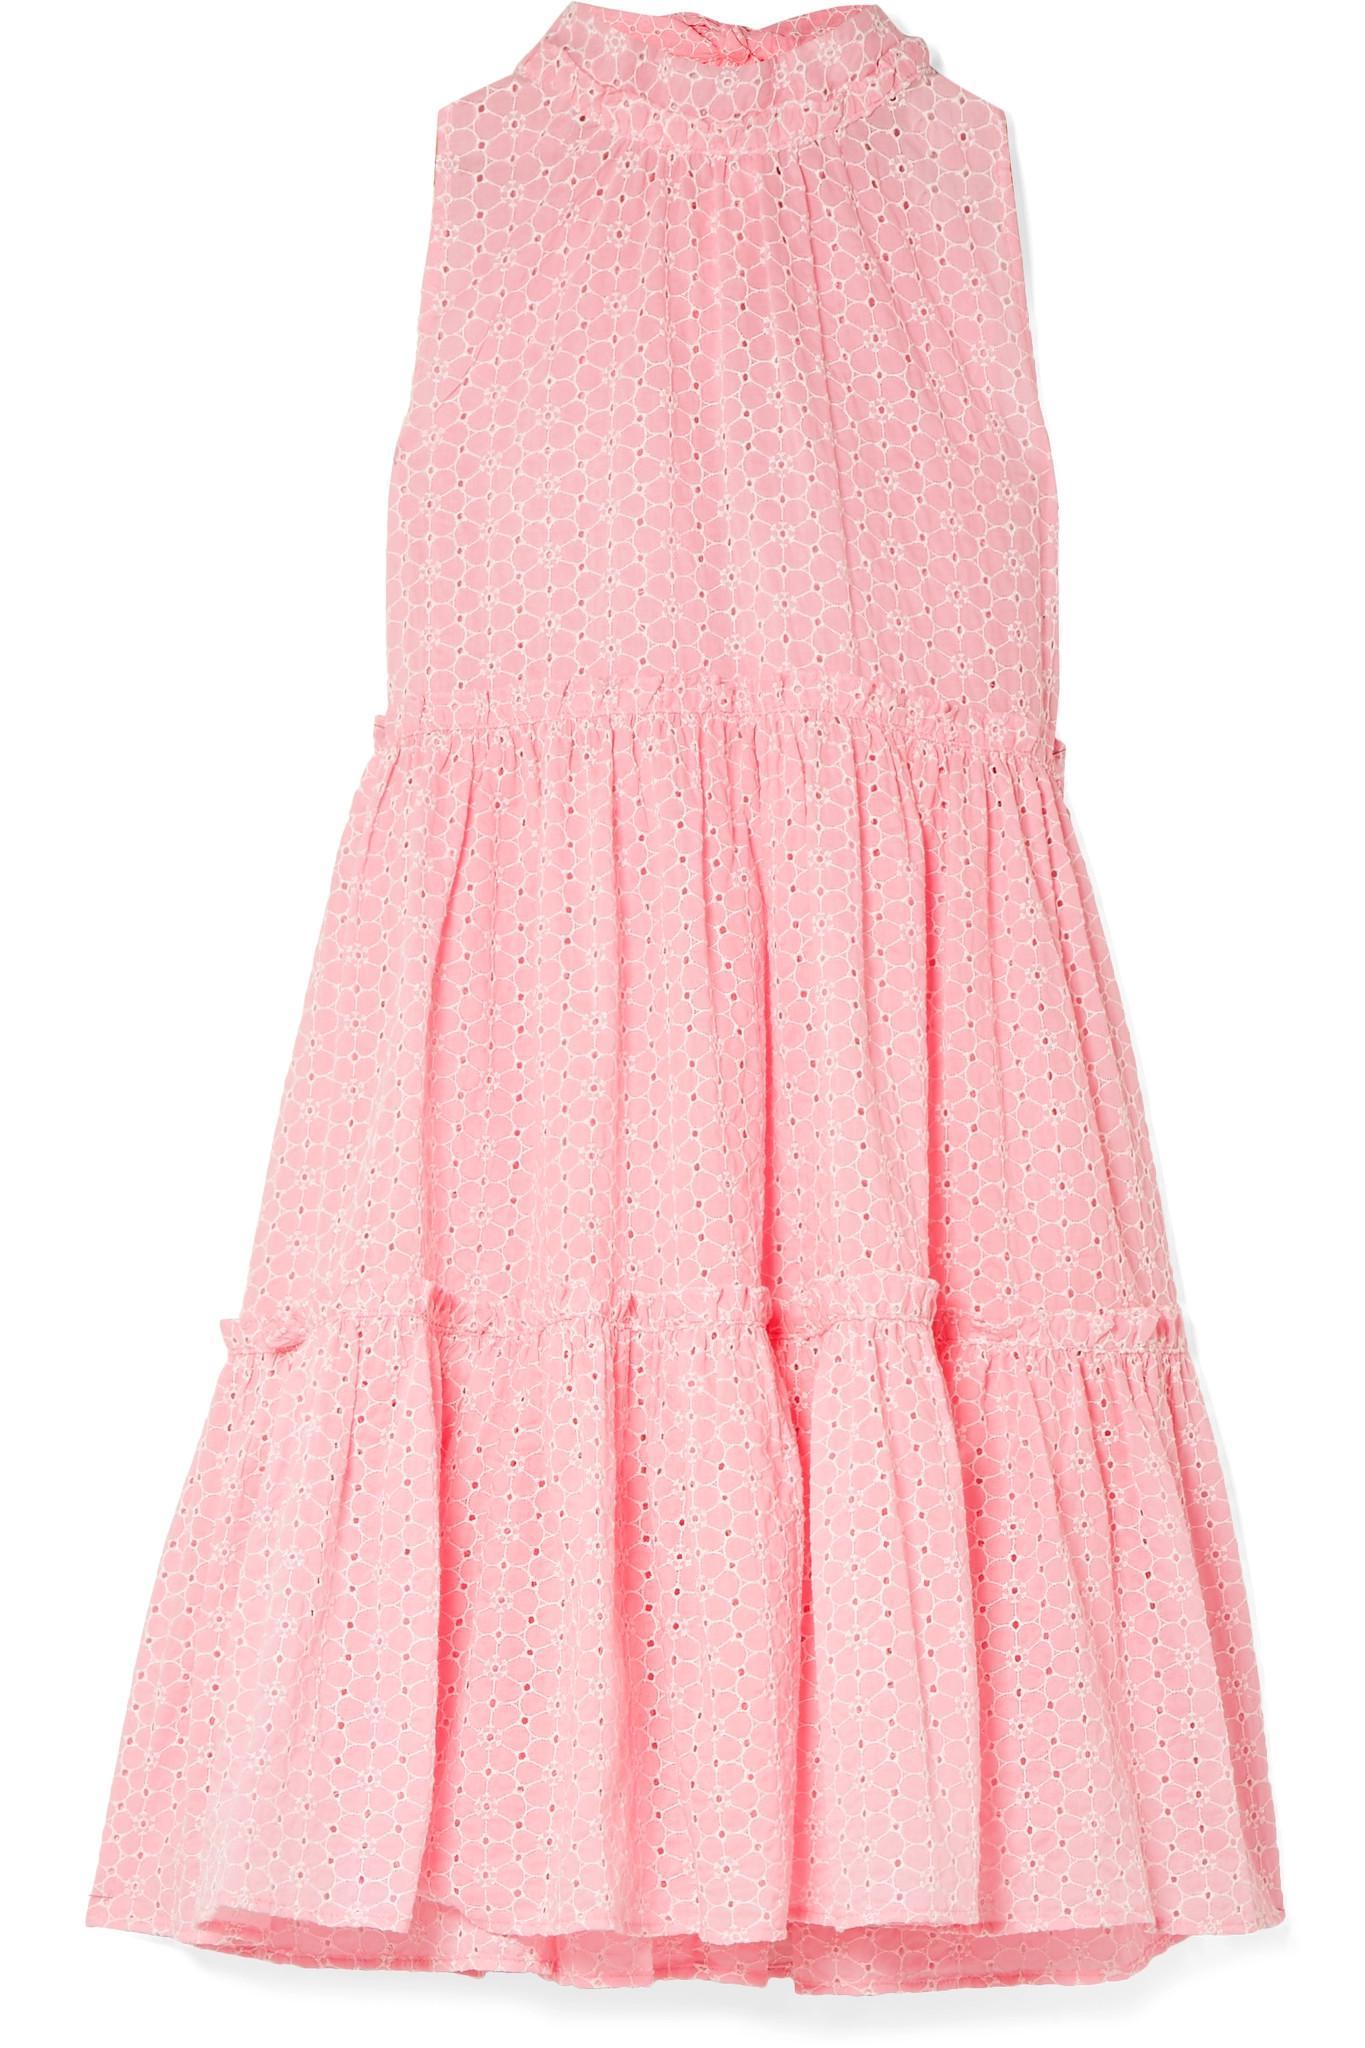 Erica Ruffled Broderie Anglaise Cotton Mini Dress - Baby pink Lisa Marie Fernandez Kjiuf2